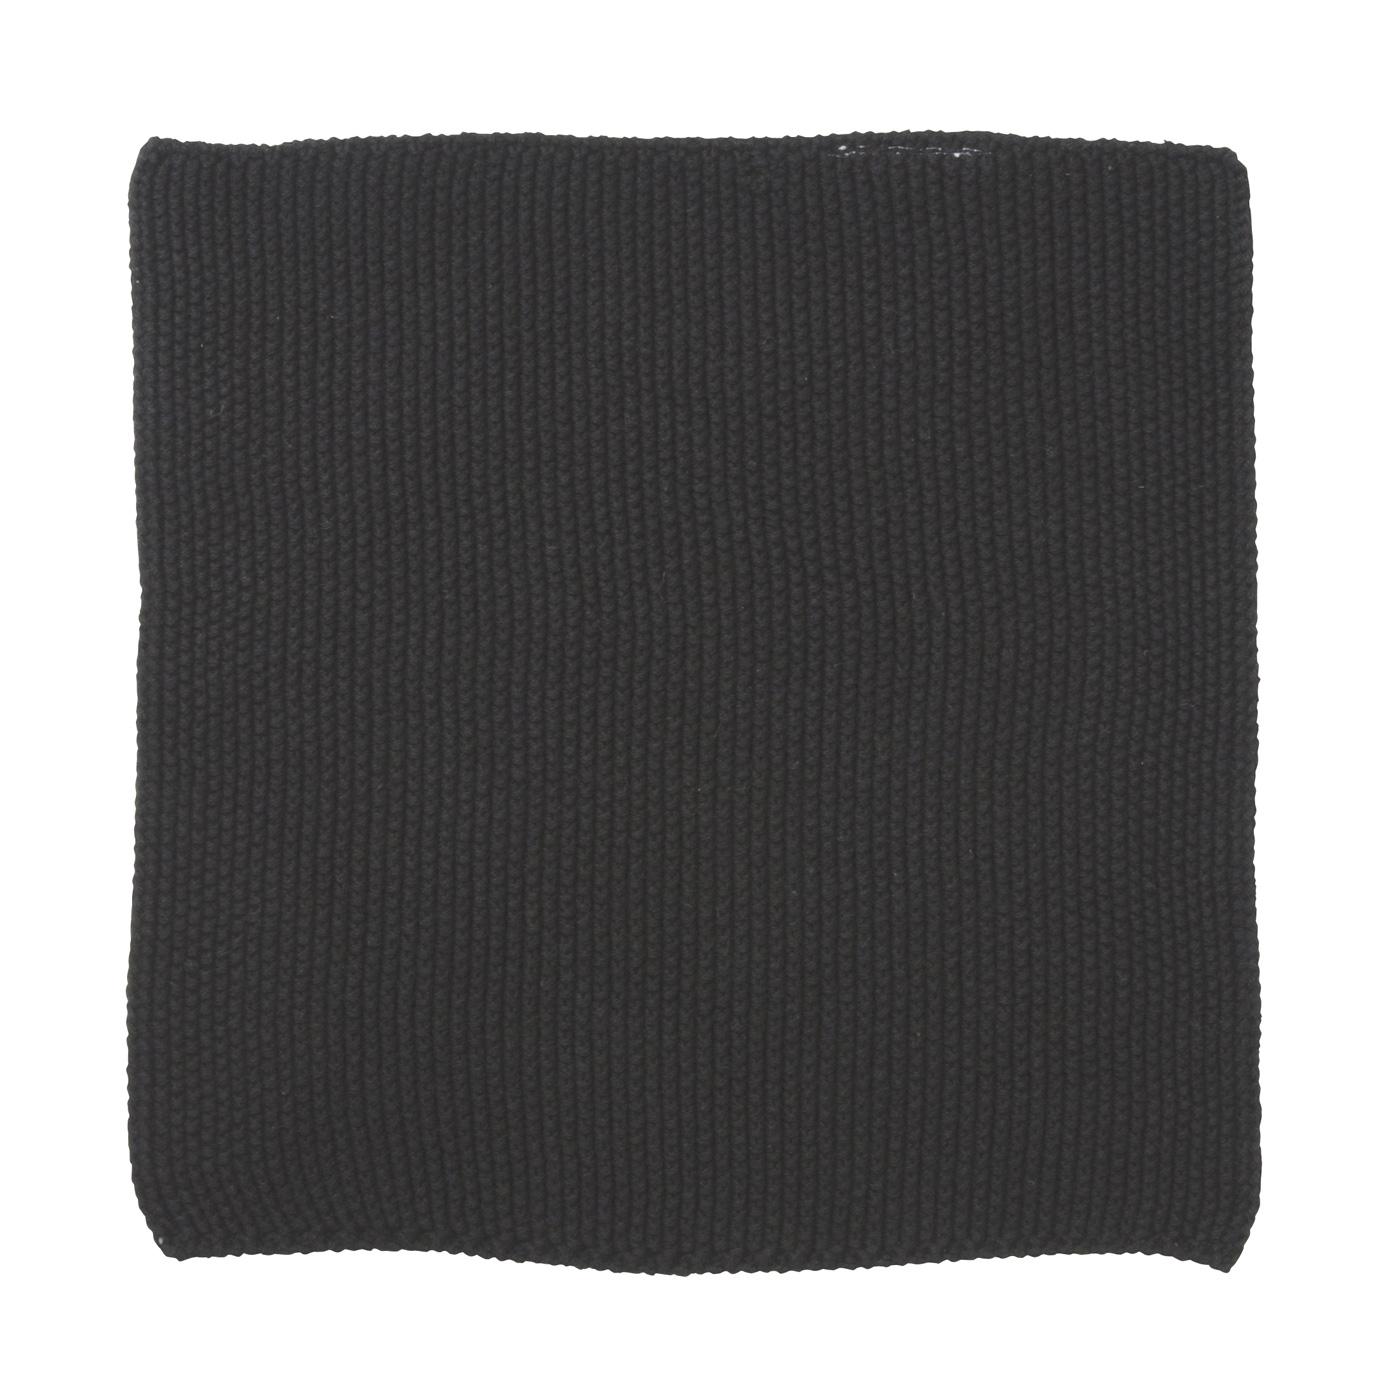 ib laursen sp llappen mynte schwarz fuchs gretel. Black Bedroom Furniture Sets. Home Design Ideas